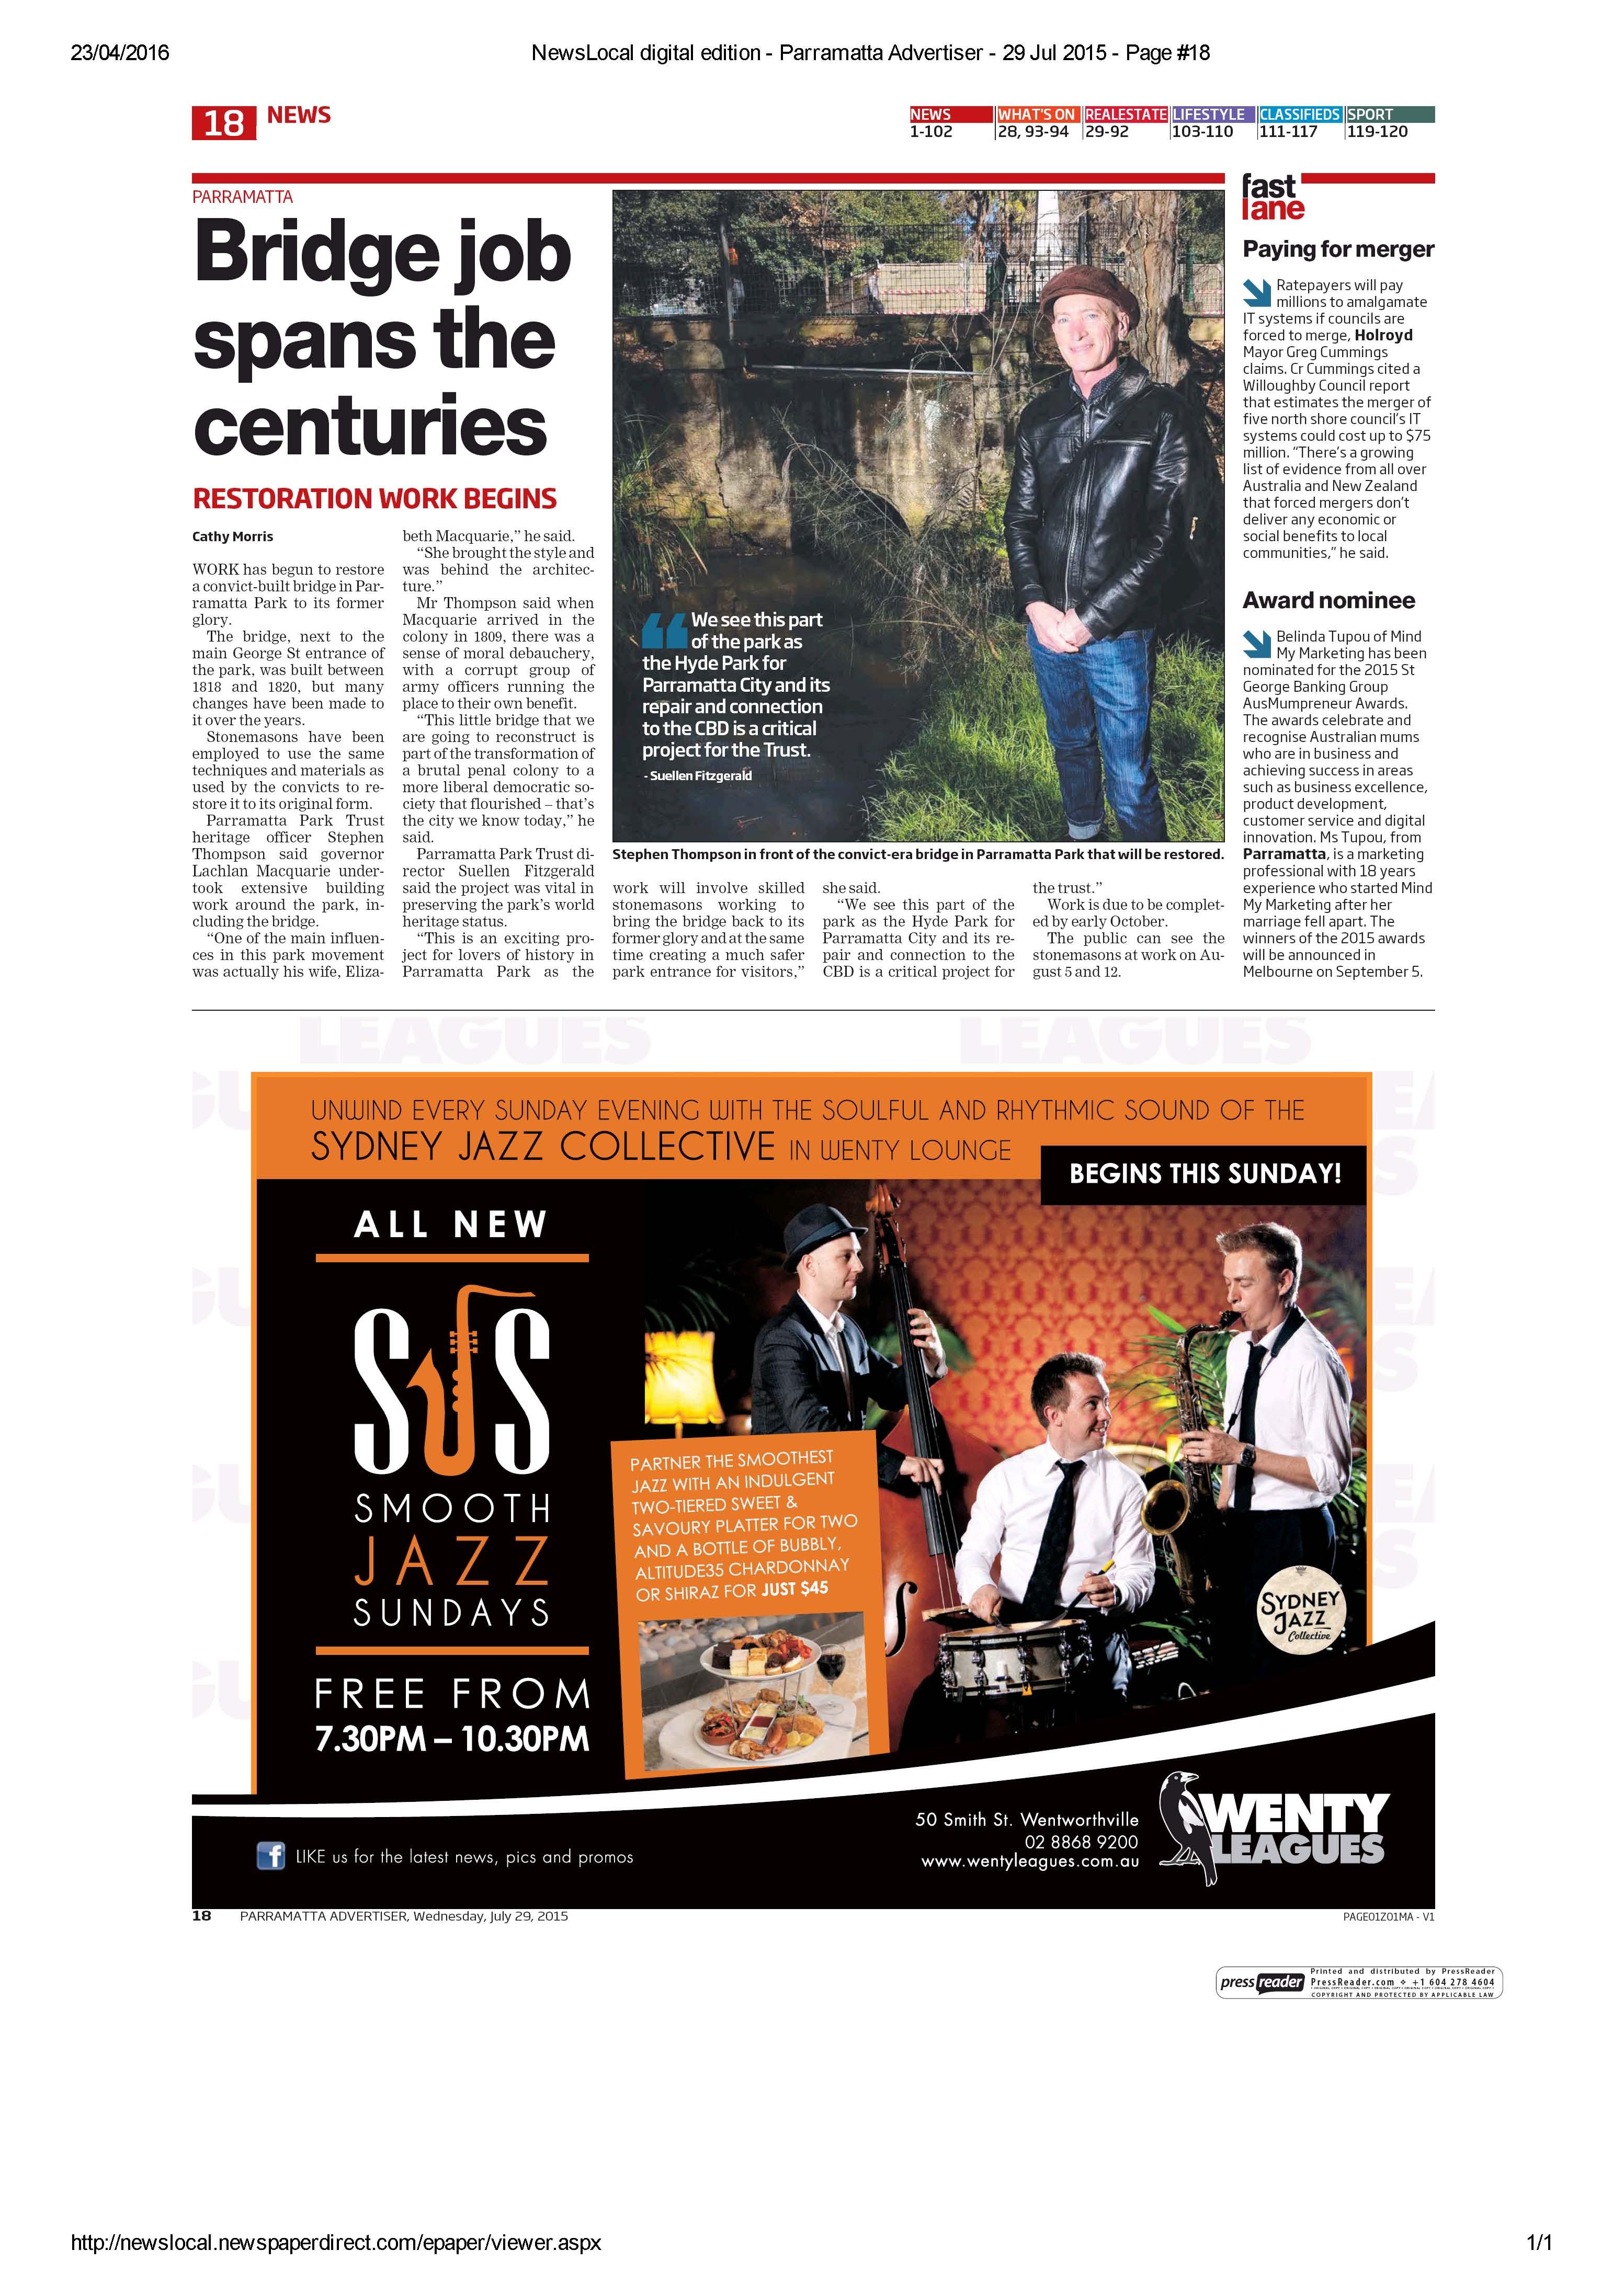 Parramatta Advertiser article 150729